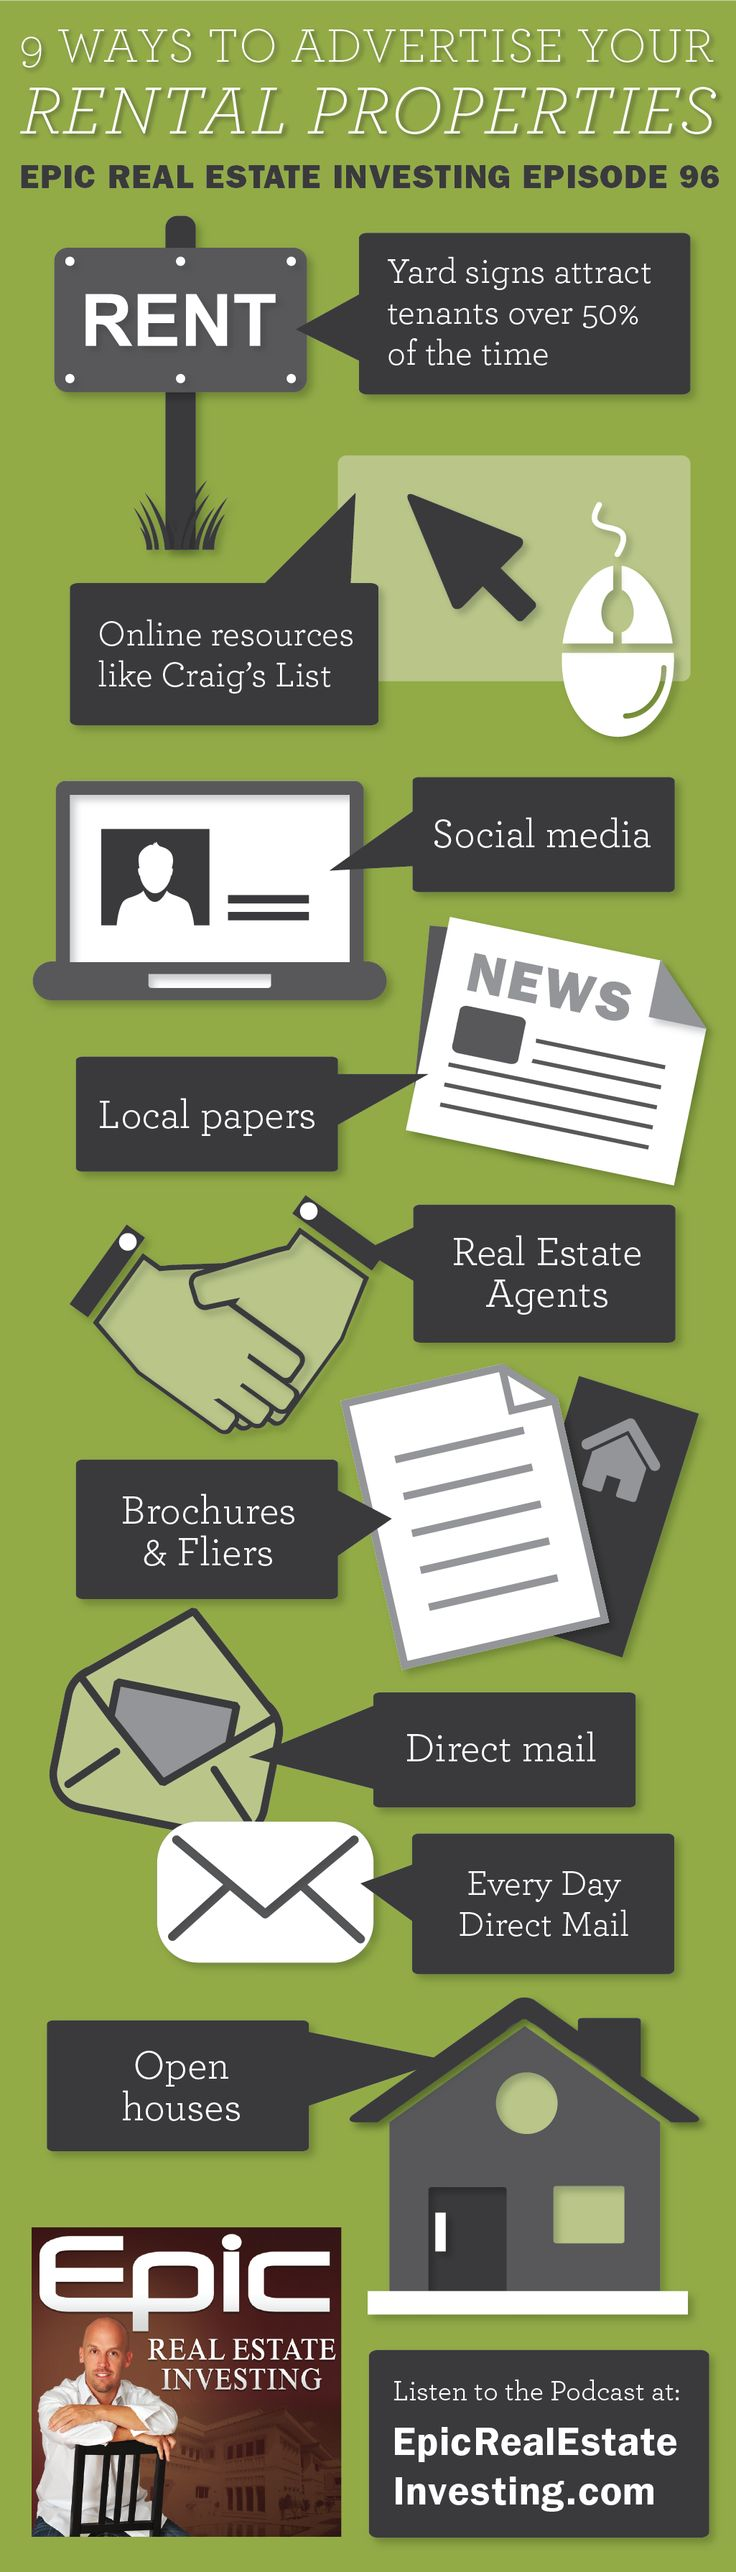 INDIANA REAL ESTATE INVESTORS ASSOCIATION Real Estate Investors Real Estate  Investor Resume Sample Customer Service Resume  Real Estate Investor Resume